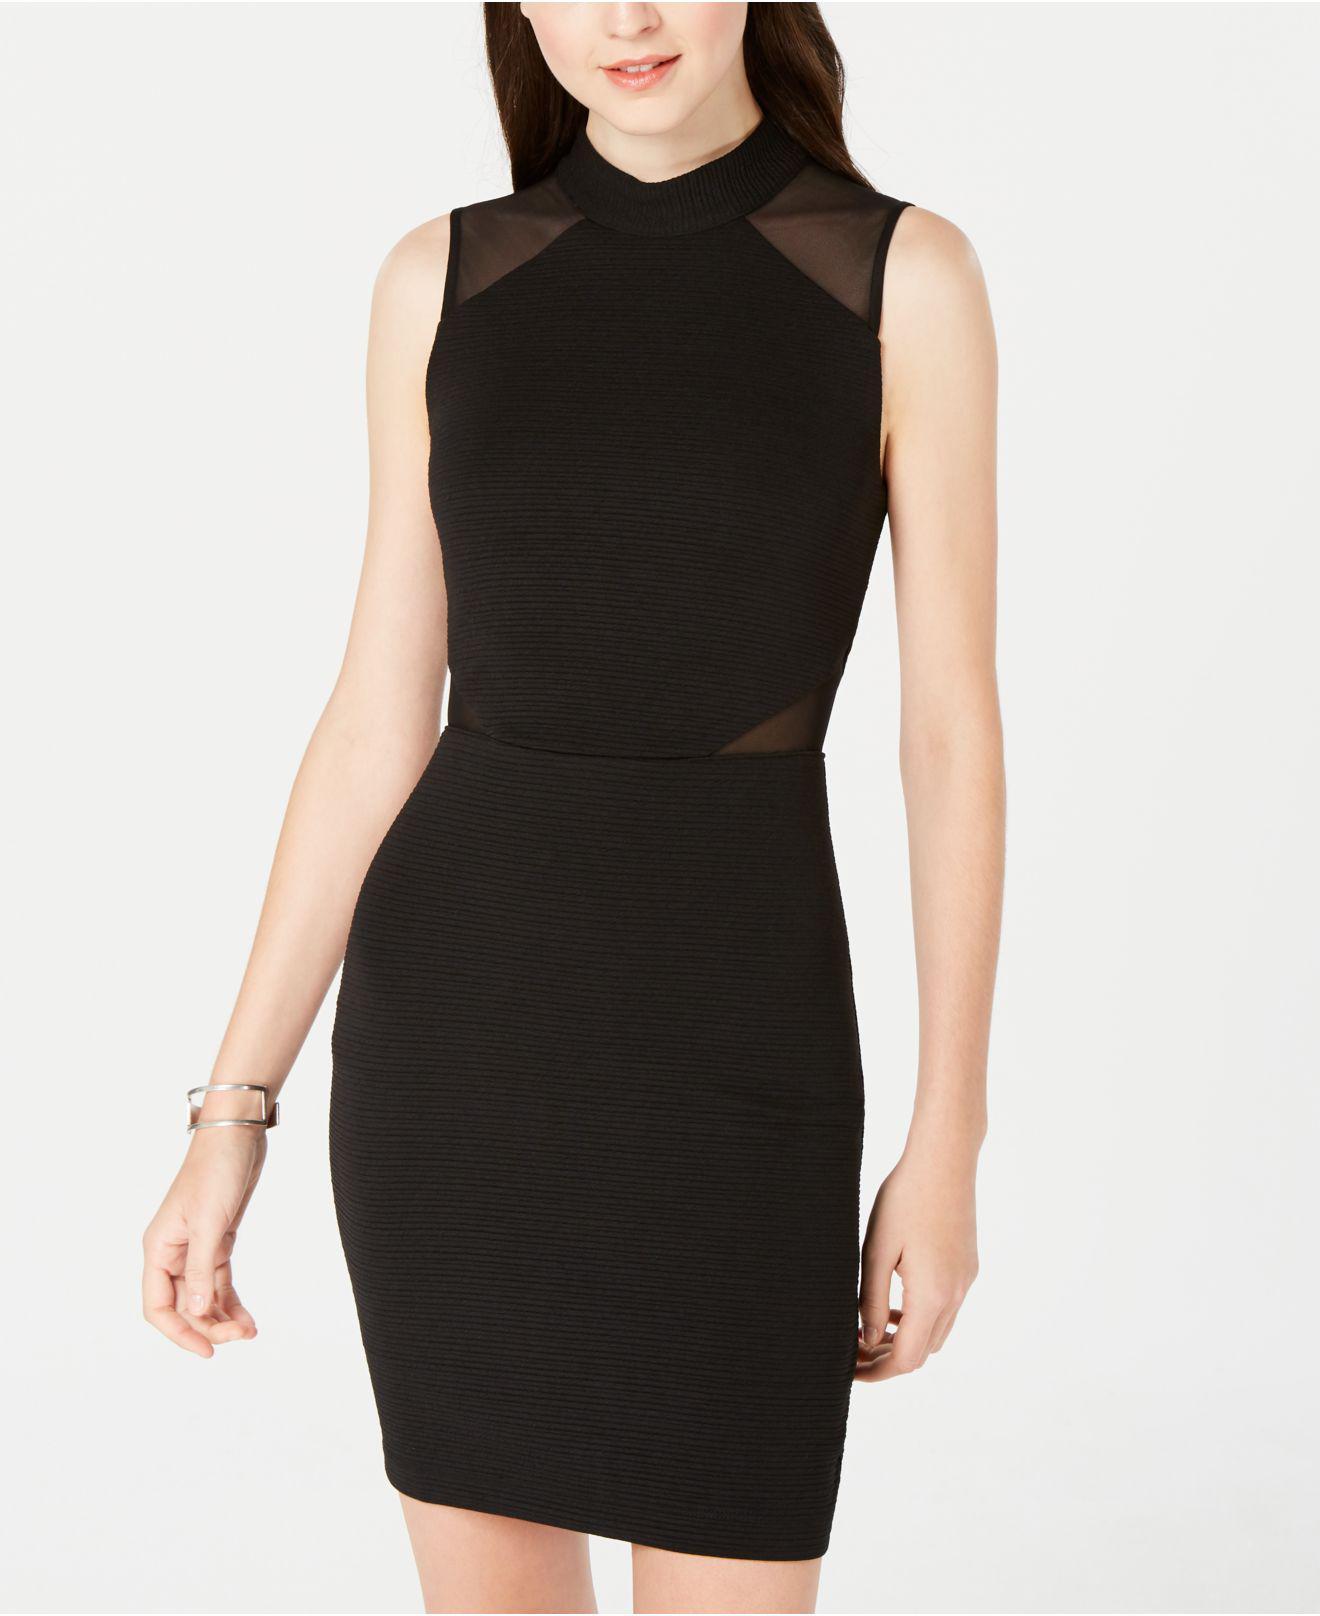 fda5b78d Emerald Sundae Juniors' Illusion Bodycon Dress in Black - Lyst